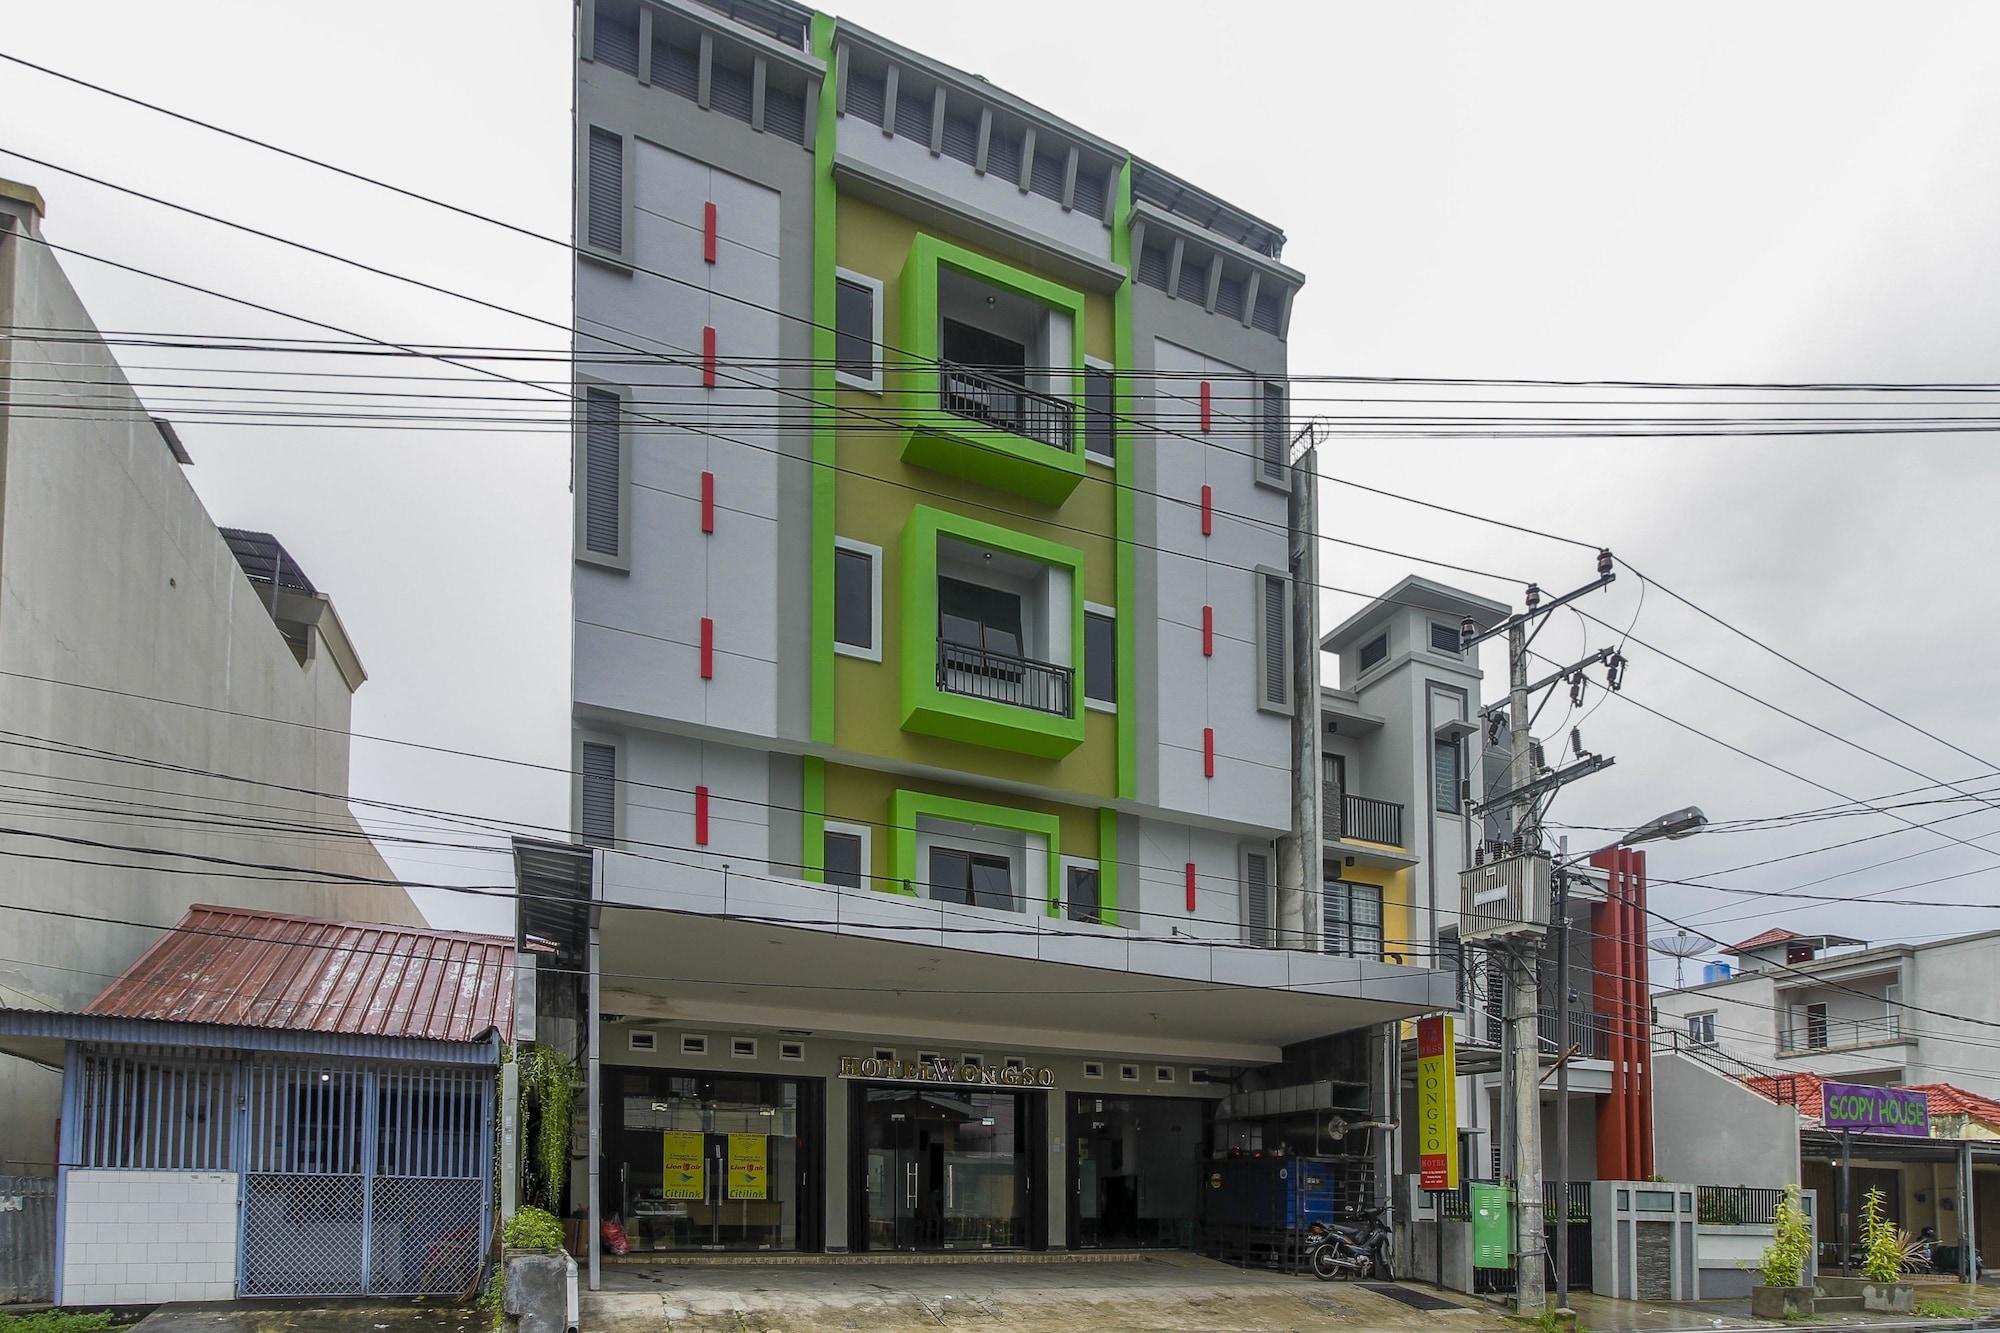 RedDoorz Syariah @ Kampung Bintang, Bangka Tengah